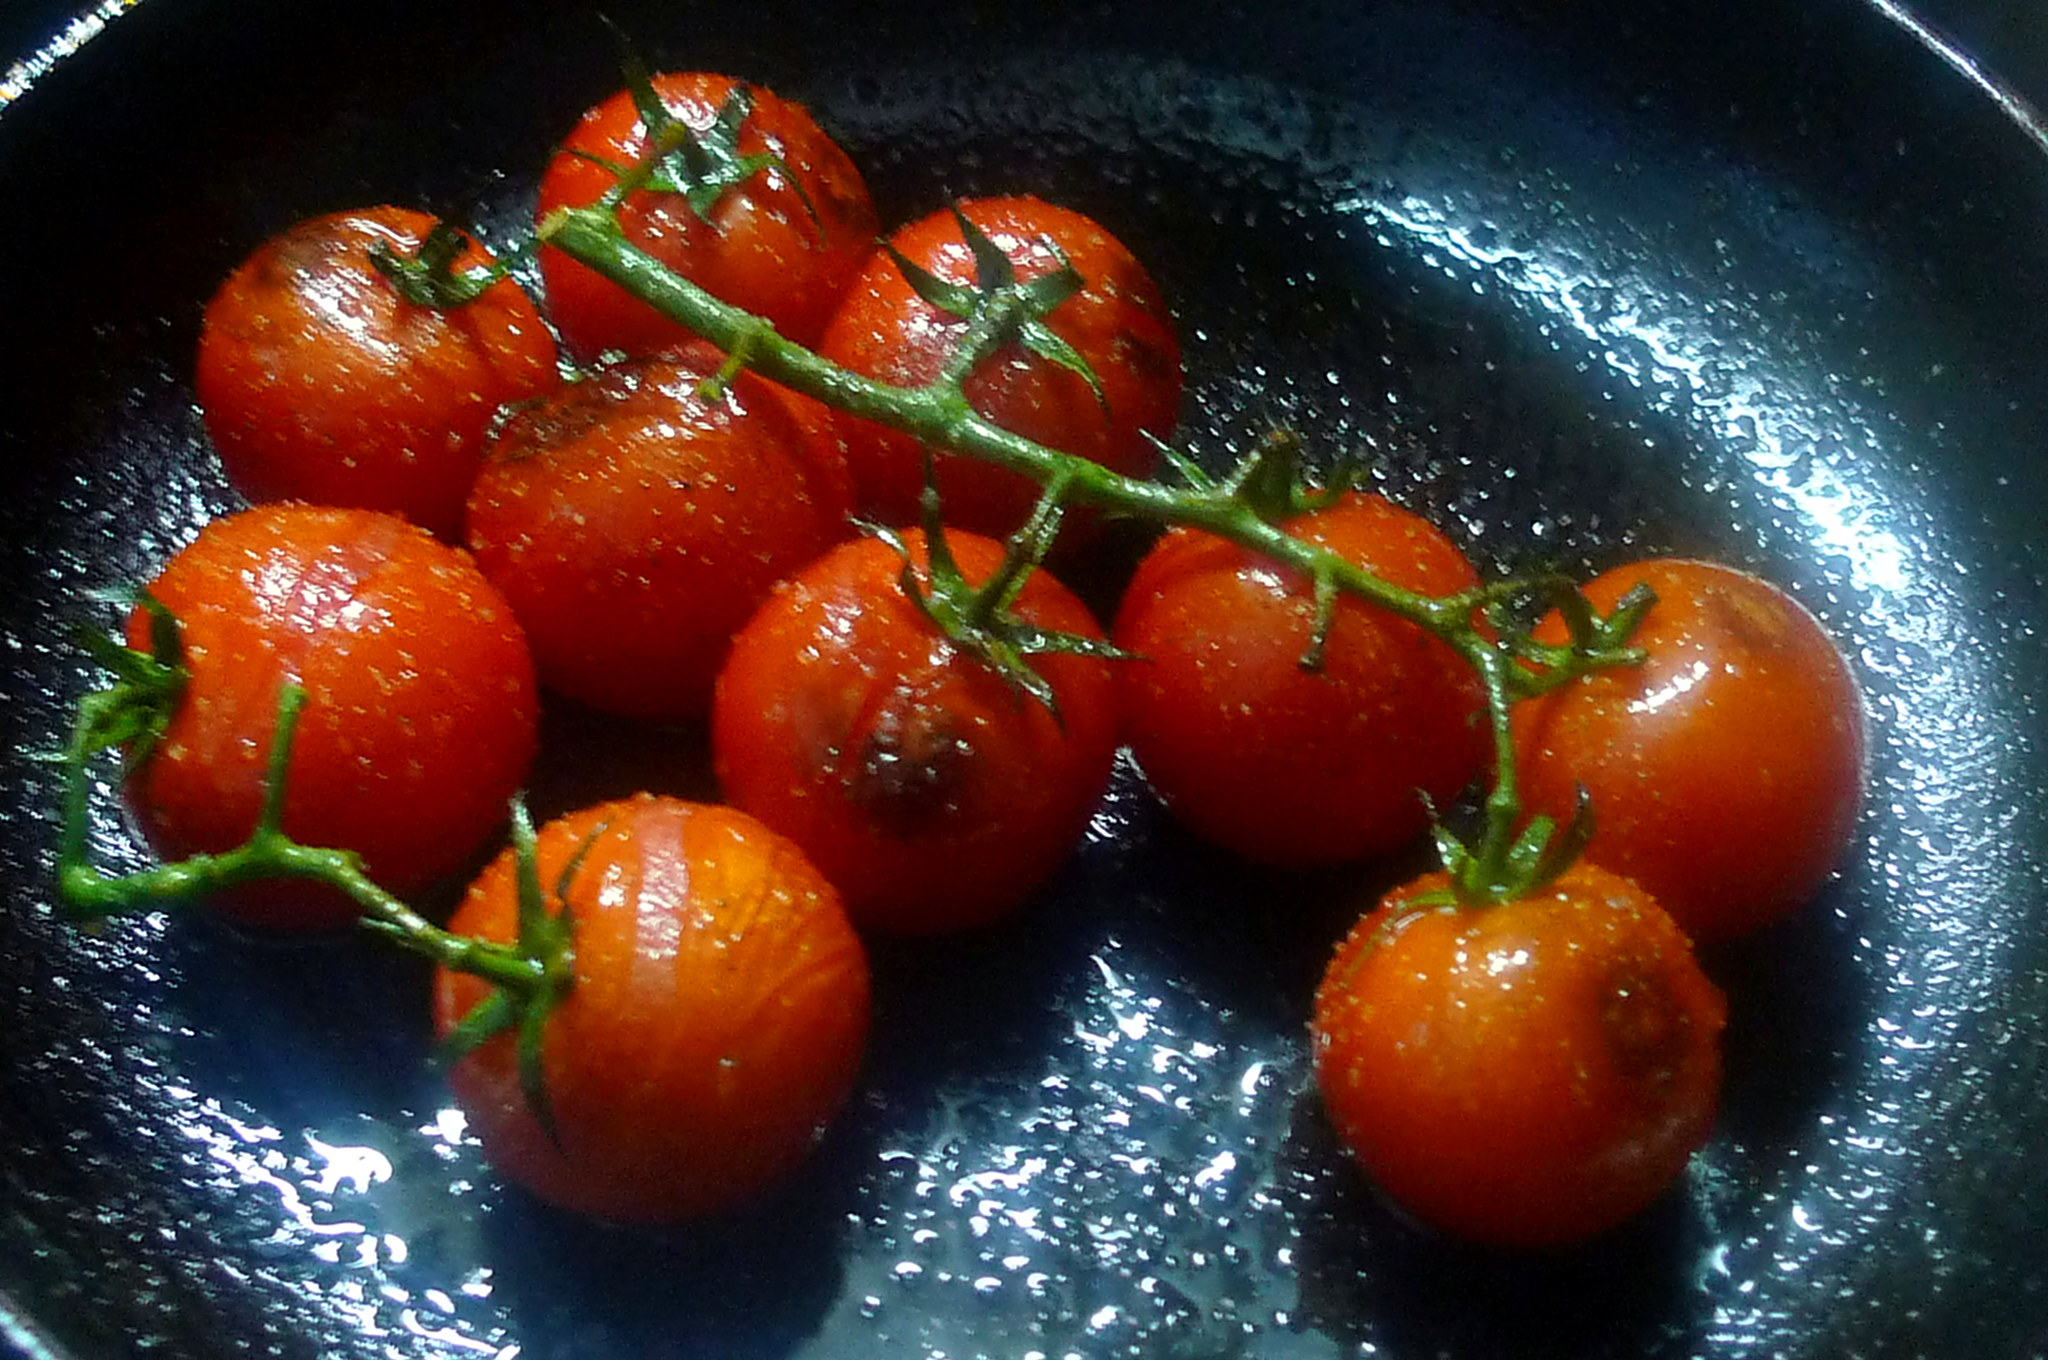 Spinat mit Rührei,Salat,Kartoffel,gebratene Tomaten -- 11.9.14   (7)